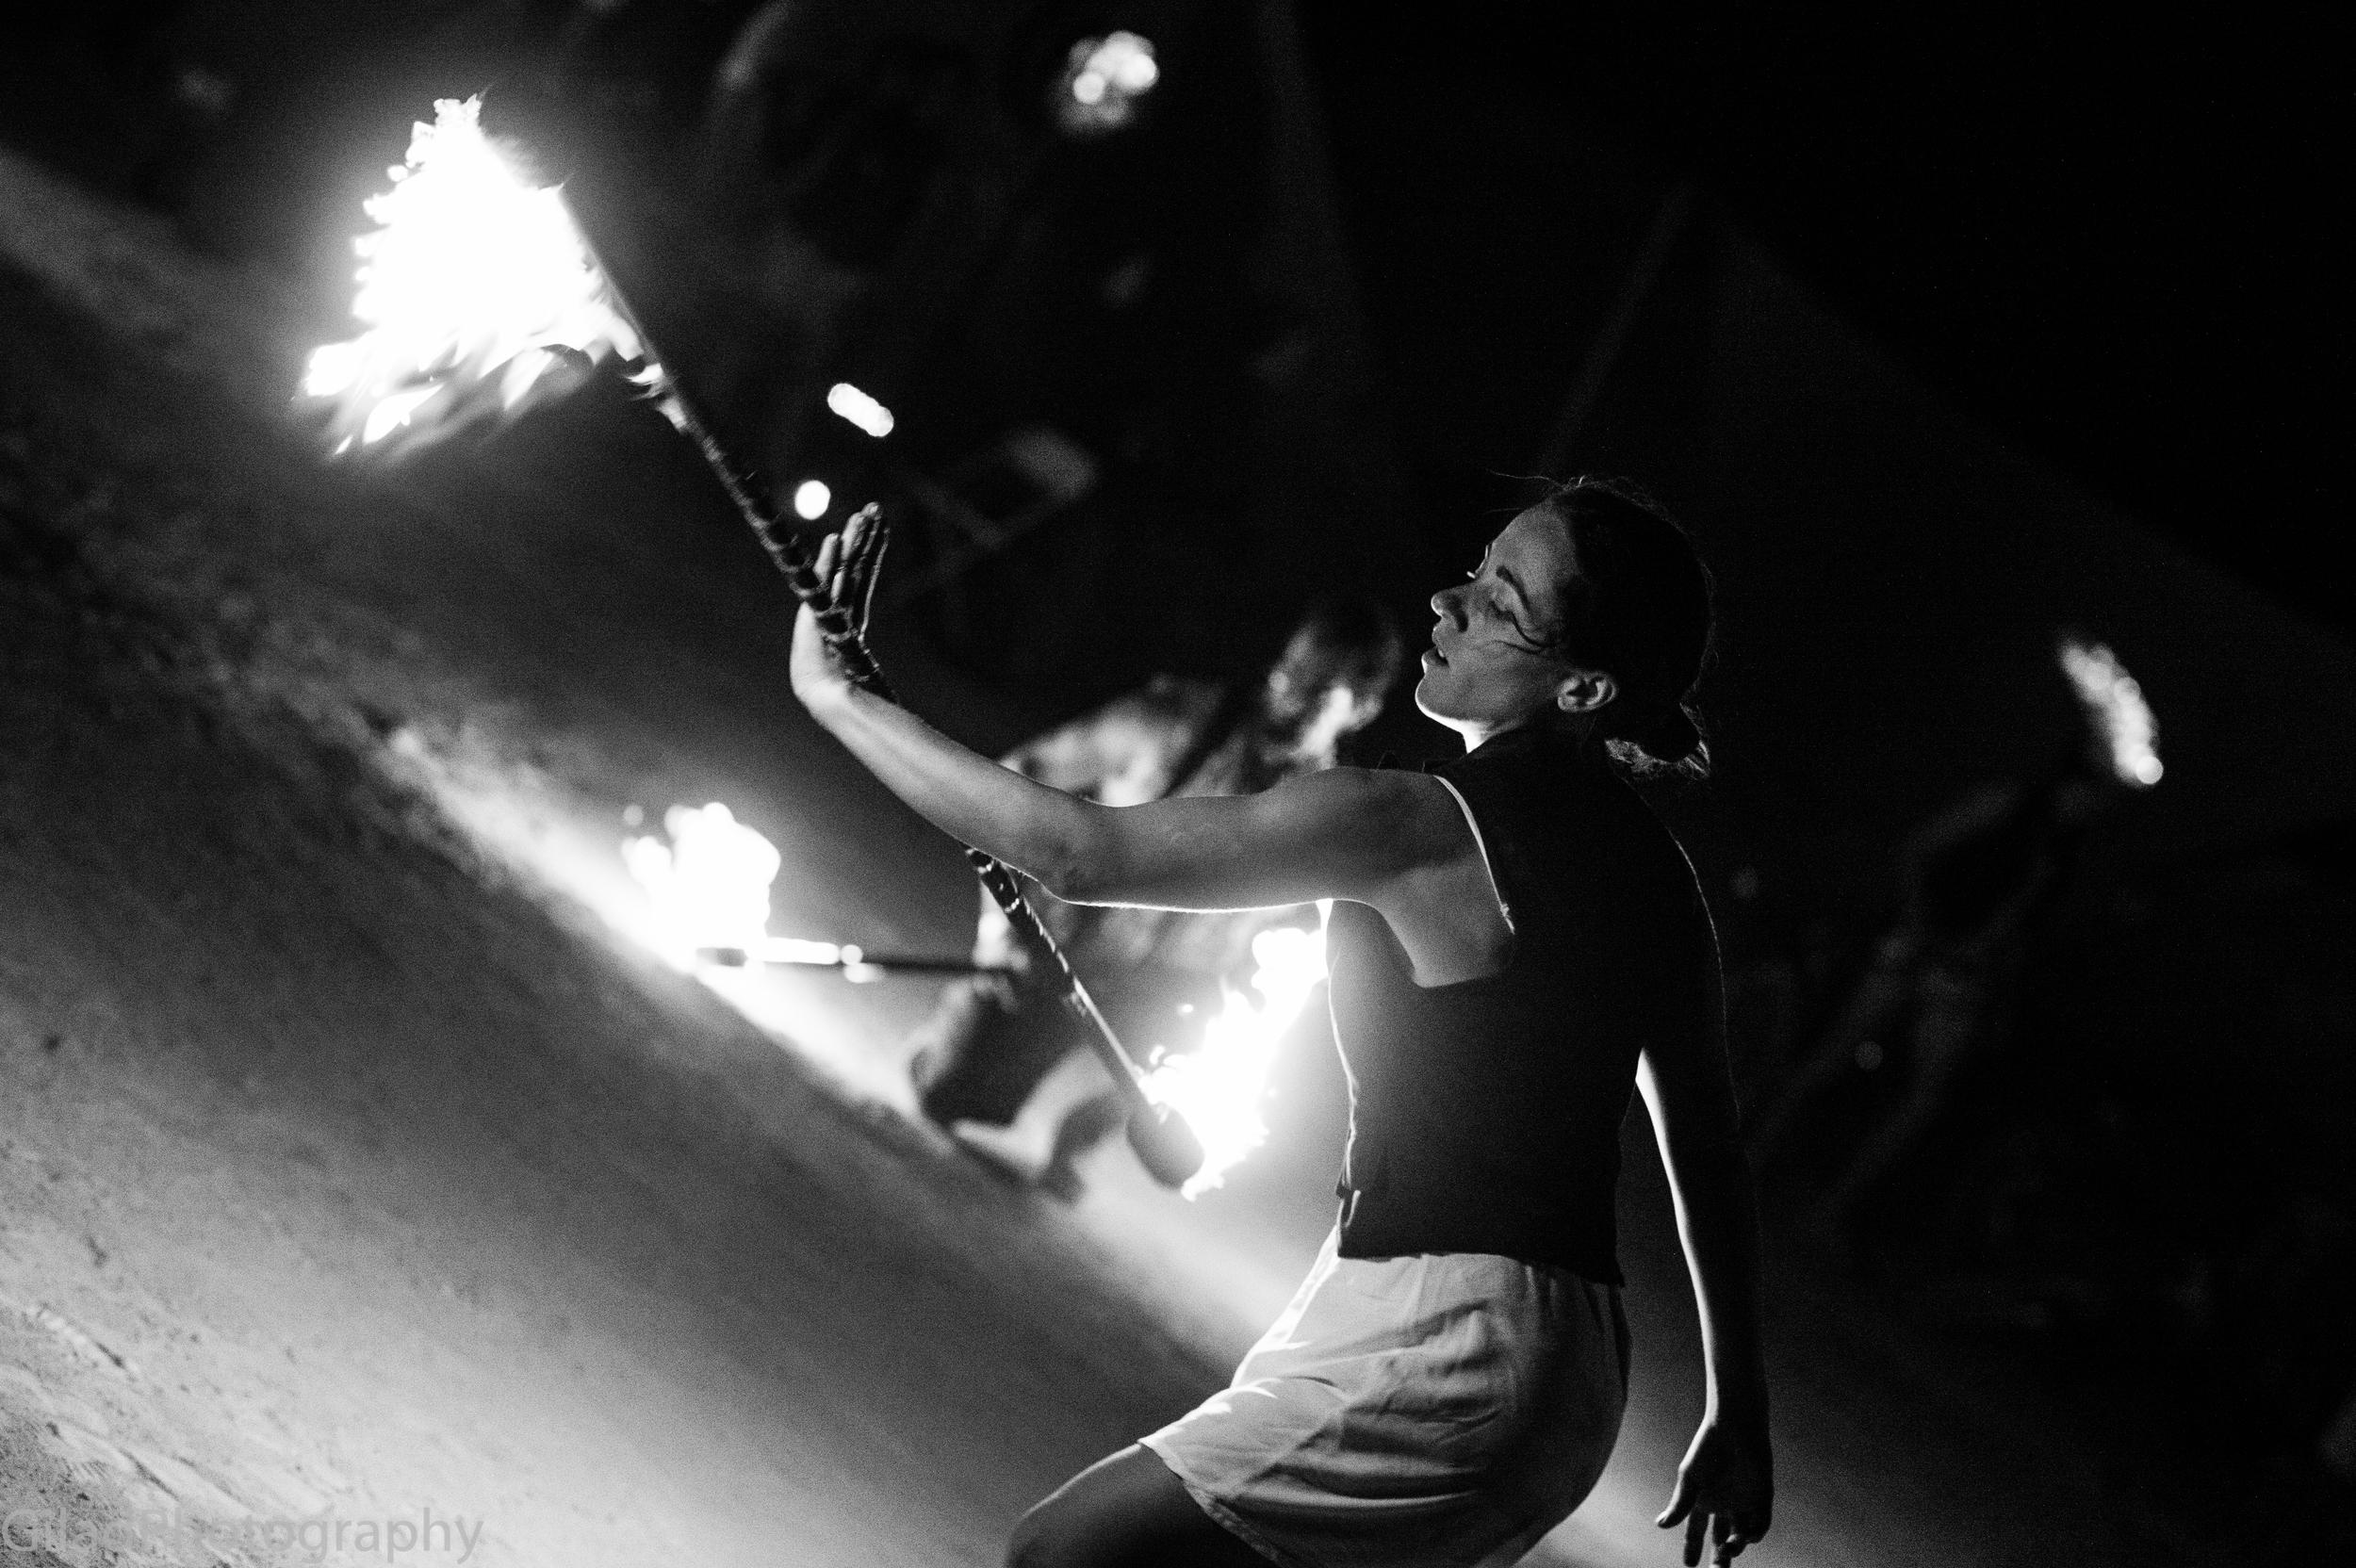 Fire Spinning at Burning Man